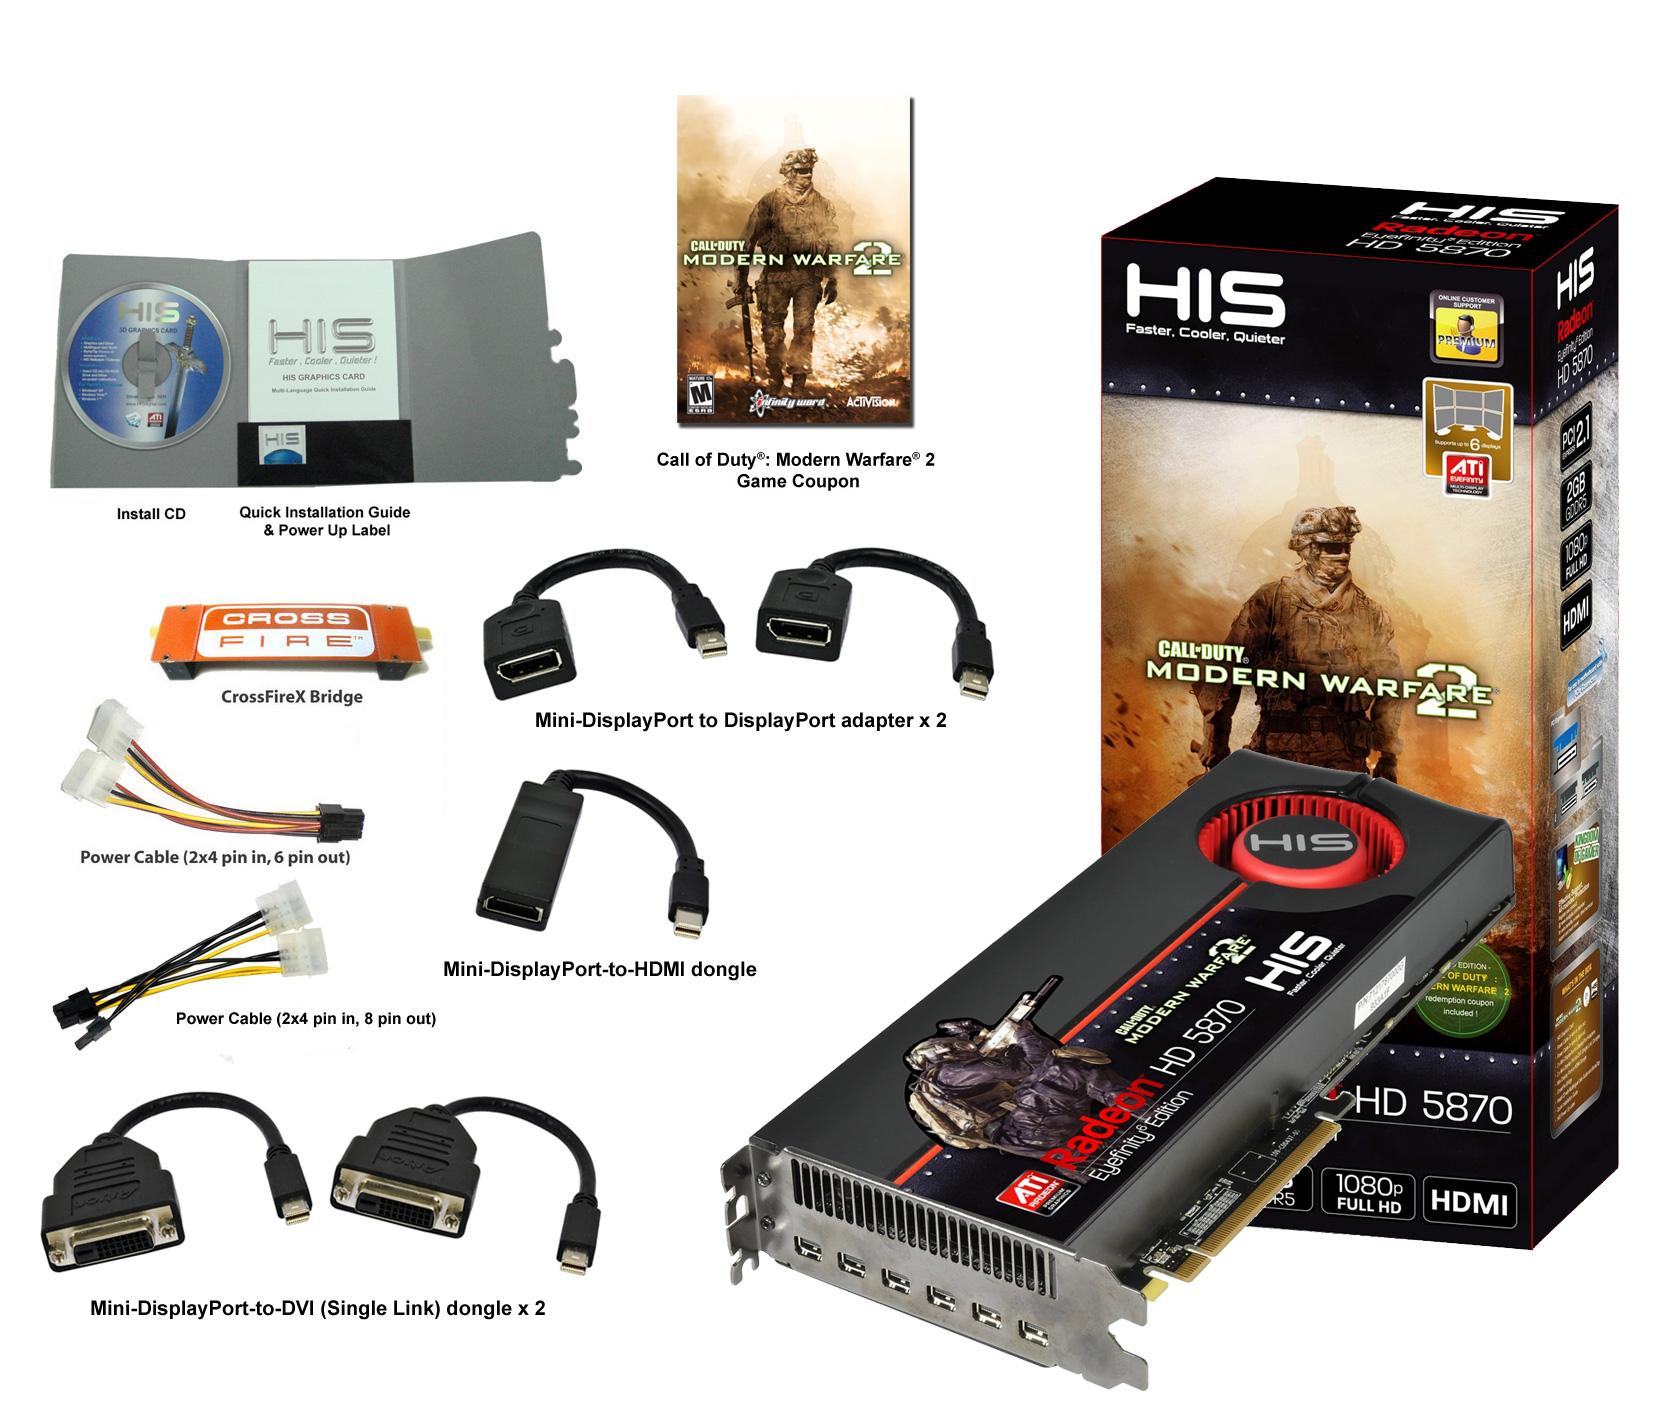 HIS HD 5870 (DirectX 11/ Eyefinity/ Full HD 1080p) 2GB